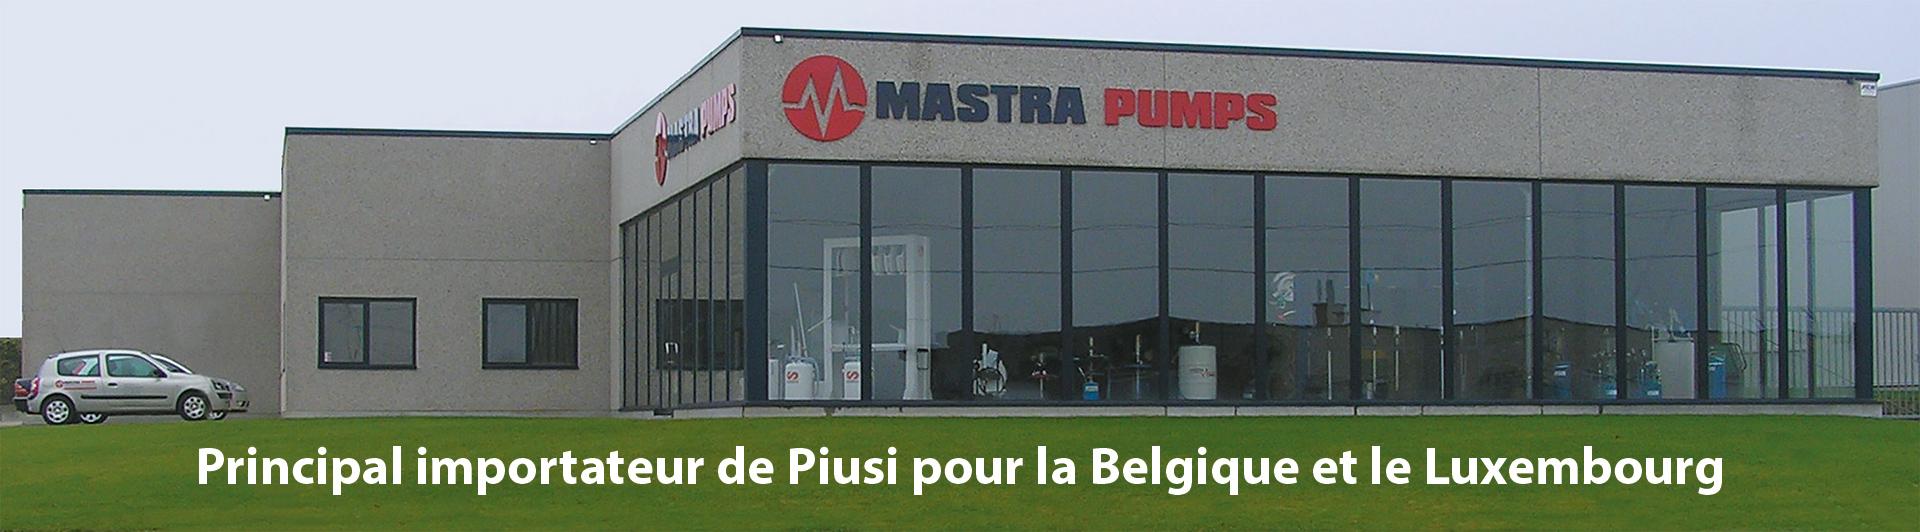 mastrapumps_fr